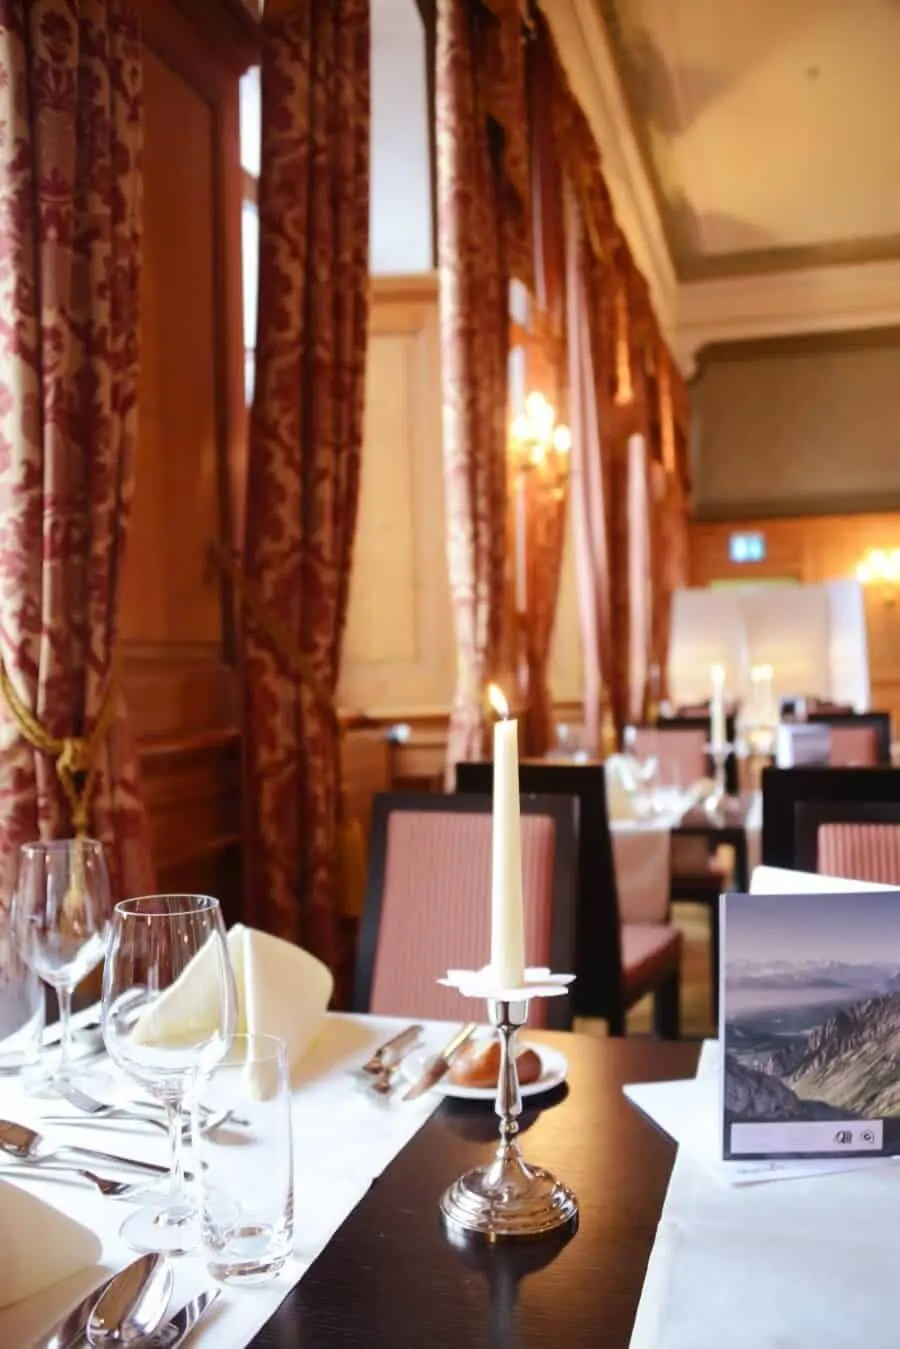 Mount Pilatus Hotel Review 35